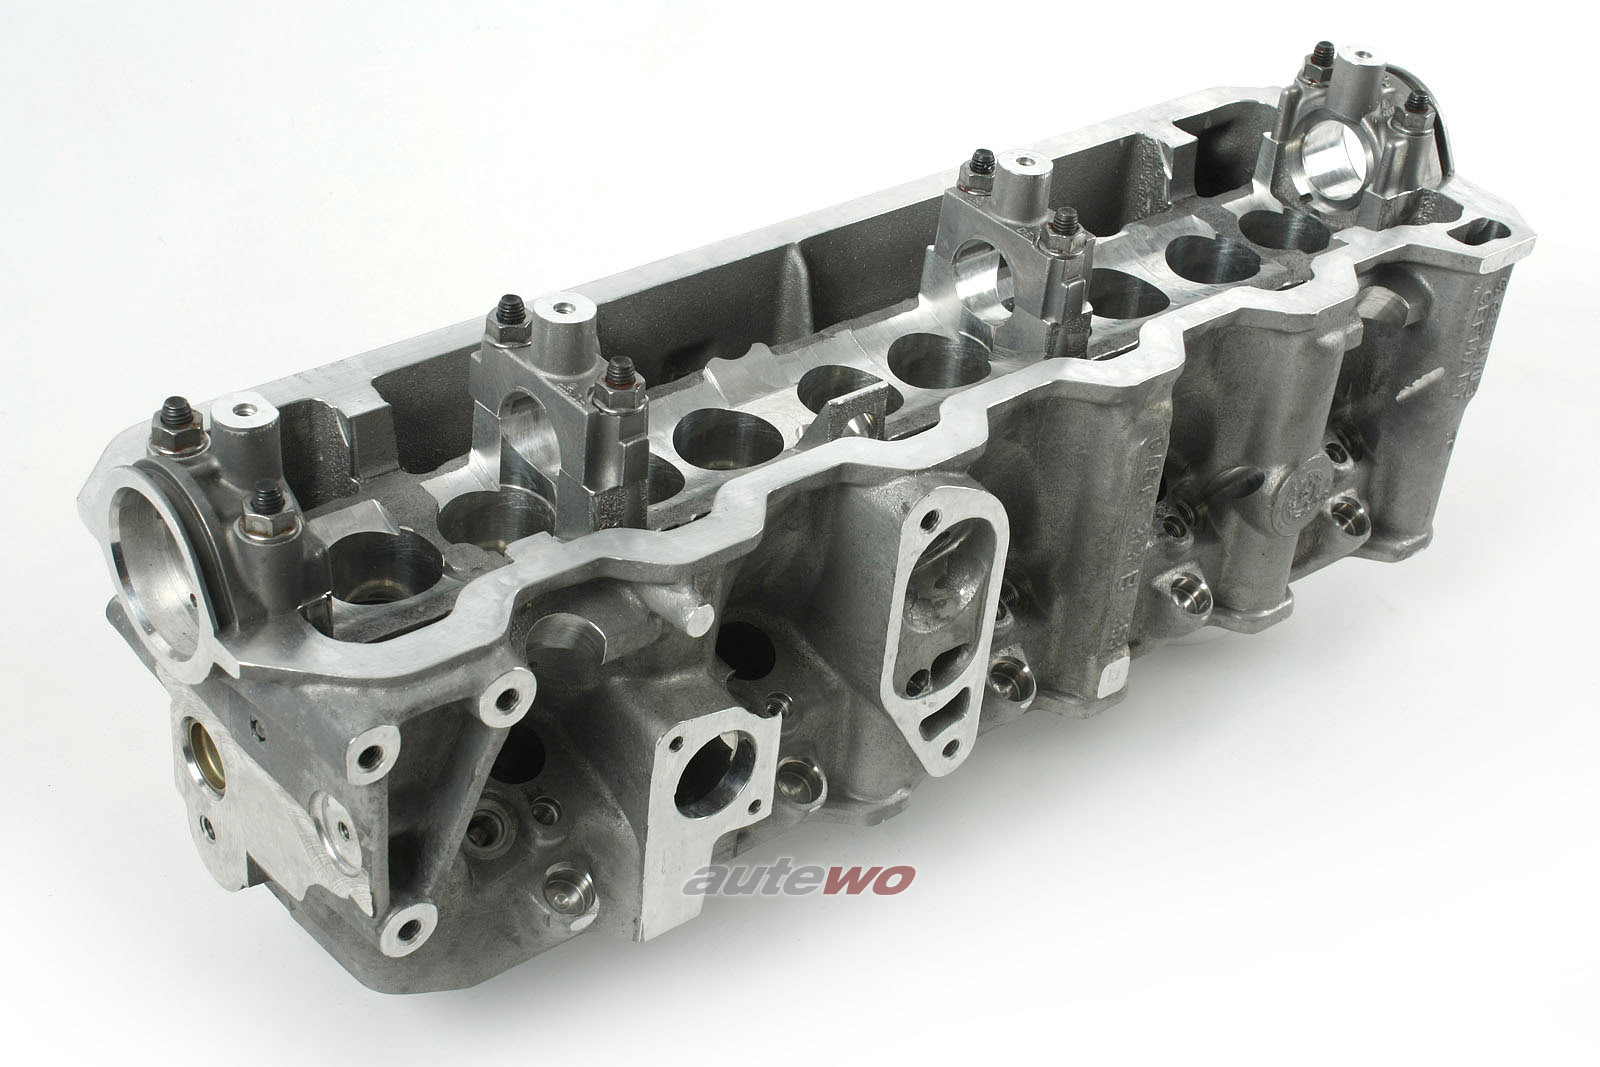 046103351C 046103353D NEU Audi 100/A6 C4 2.5l Zylinderkopf